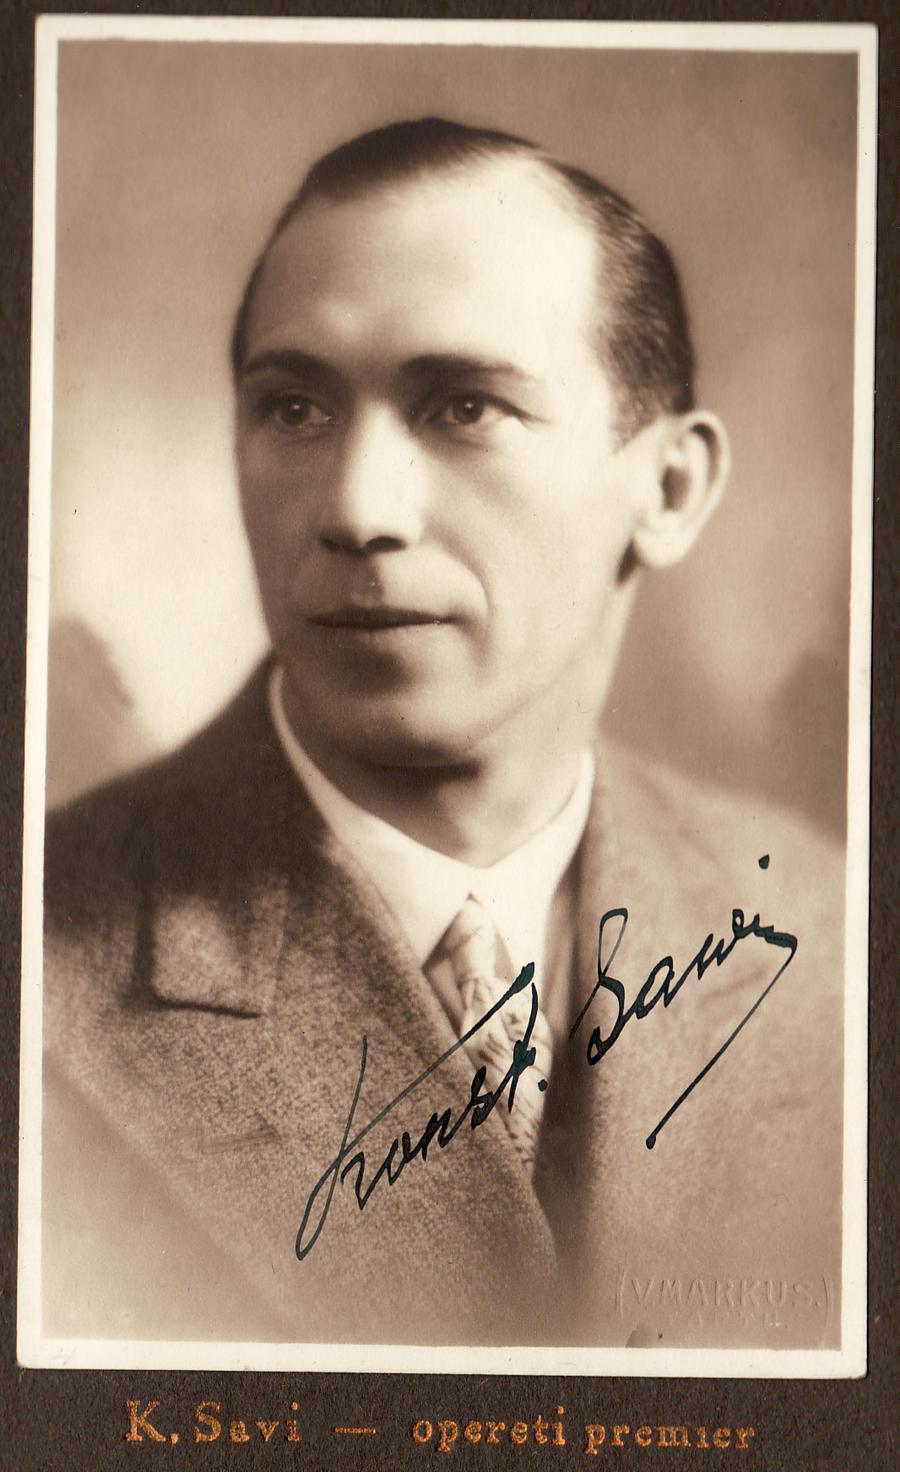 Konstantin Savi